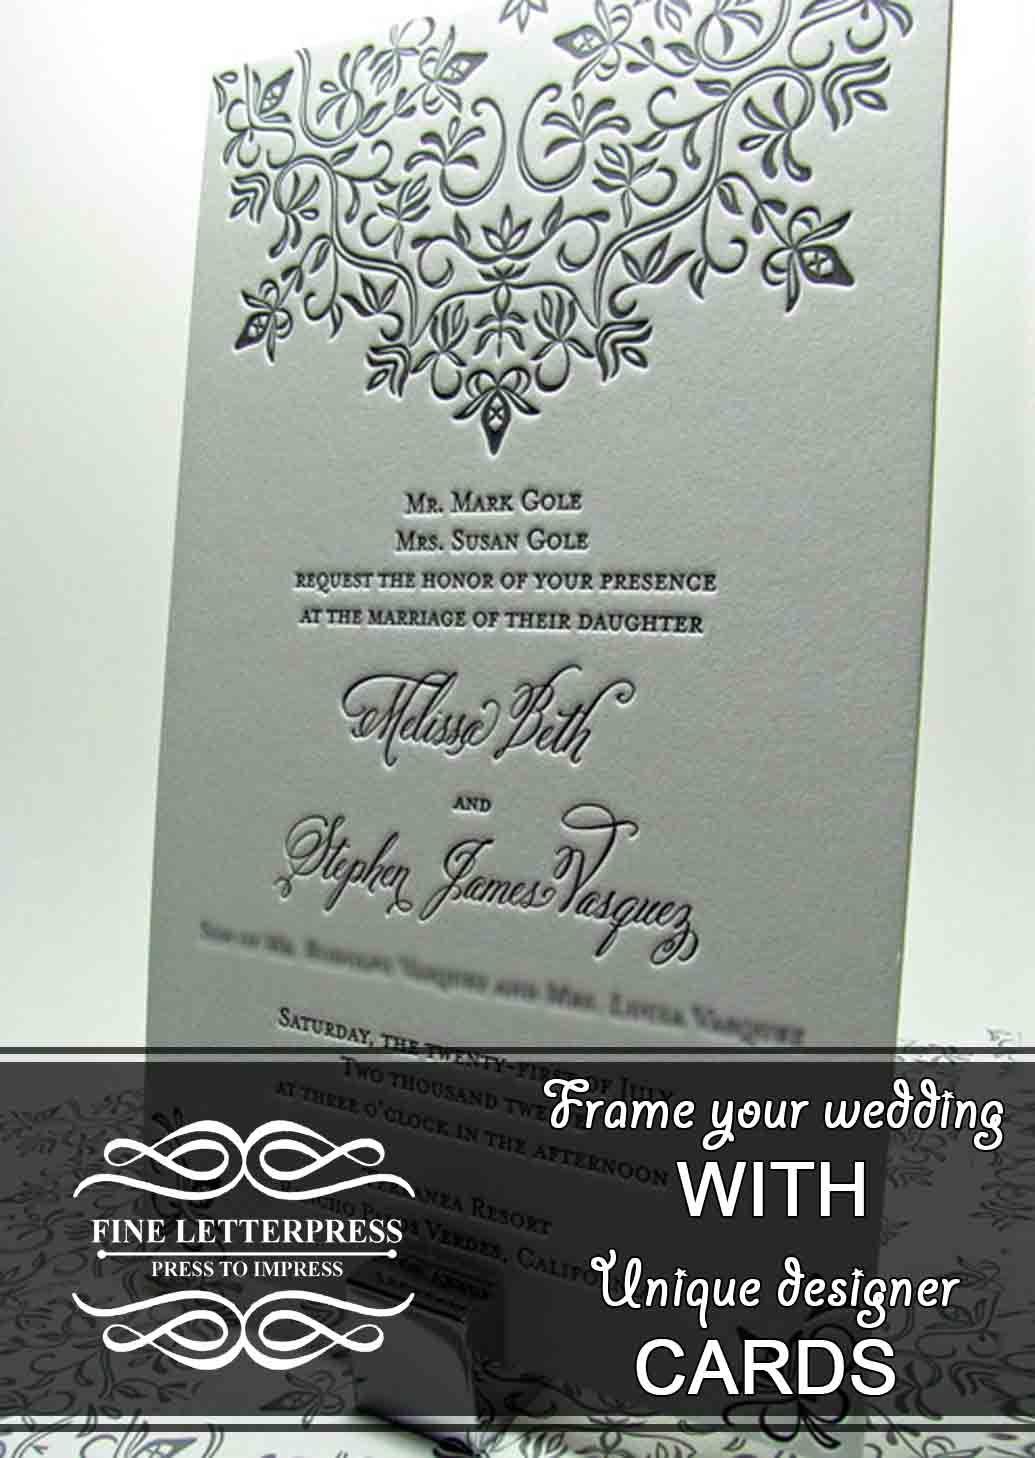 Letterpress Mehul Parikh Fine Letterpress Ahmedabad Wedding Invitations Letterpress Wedding Invitations Letterpress Wedding